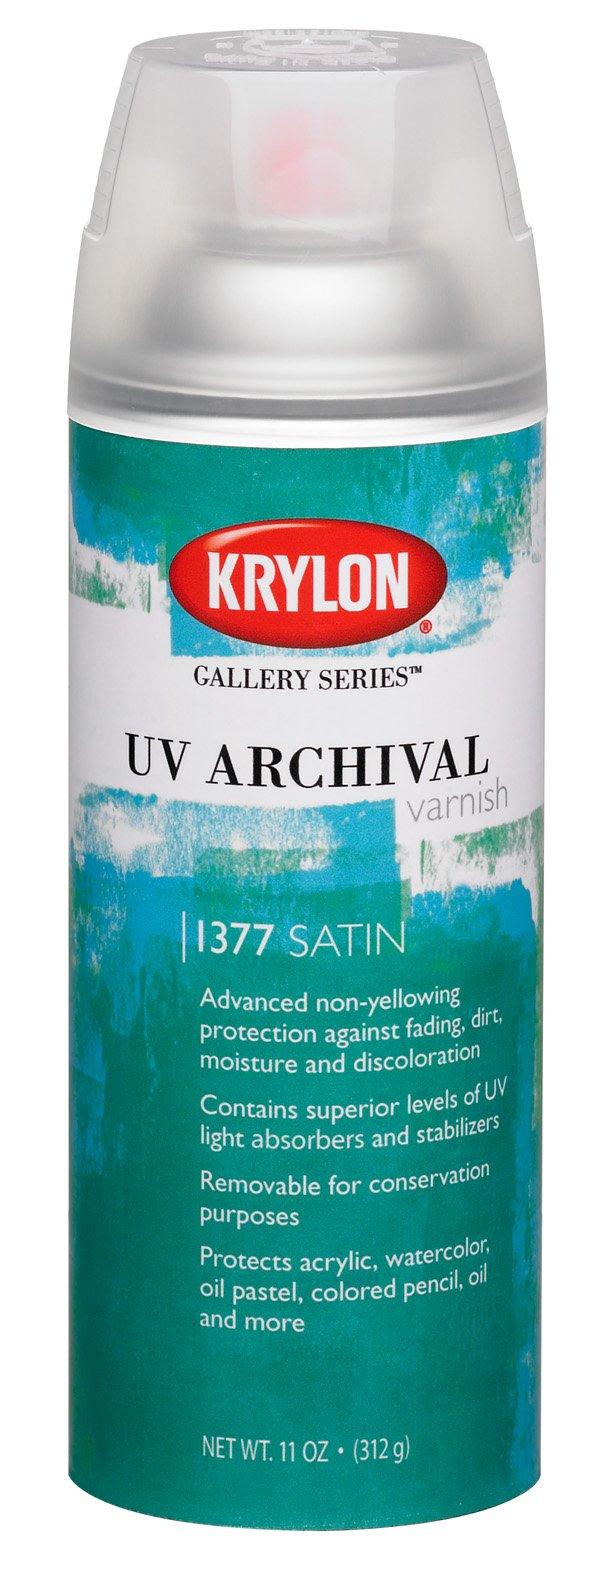 Krylon K01377000 Gallery Series UV Archival Varnish Aerosol Spray, Satin, 11 Ounce (Color: Satin, Tamaño: 1 Can)